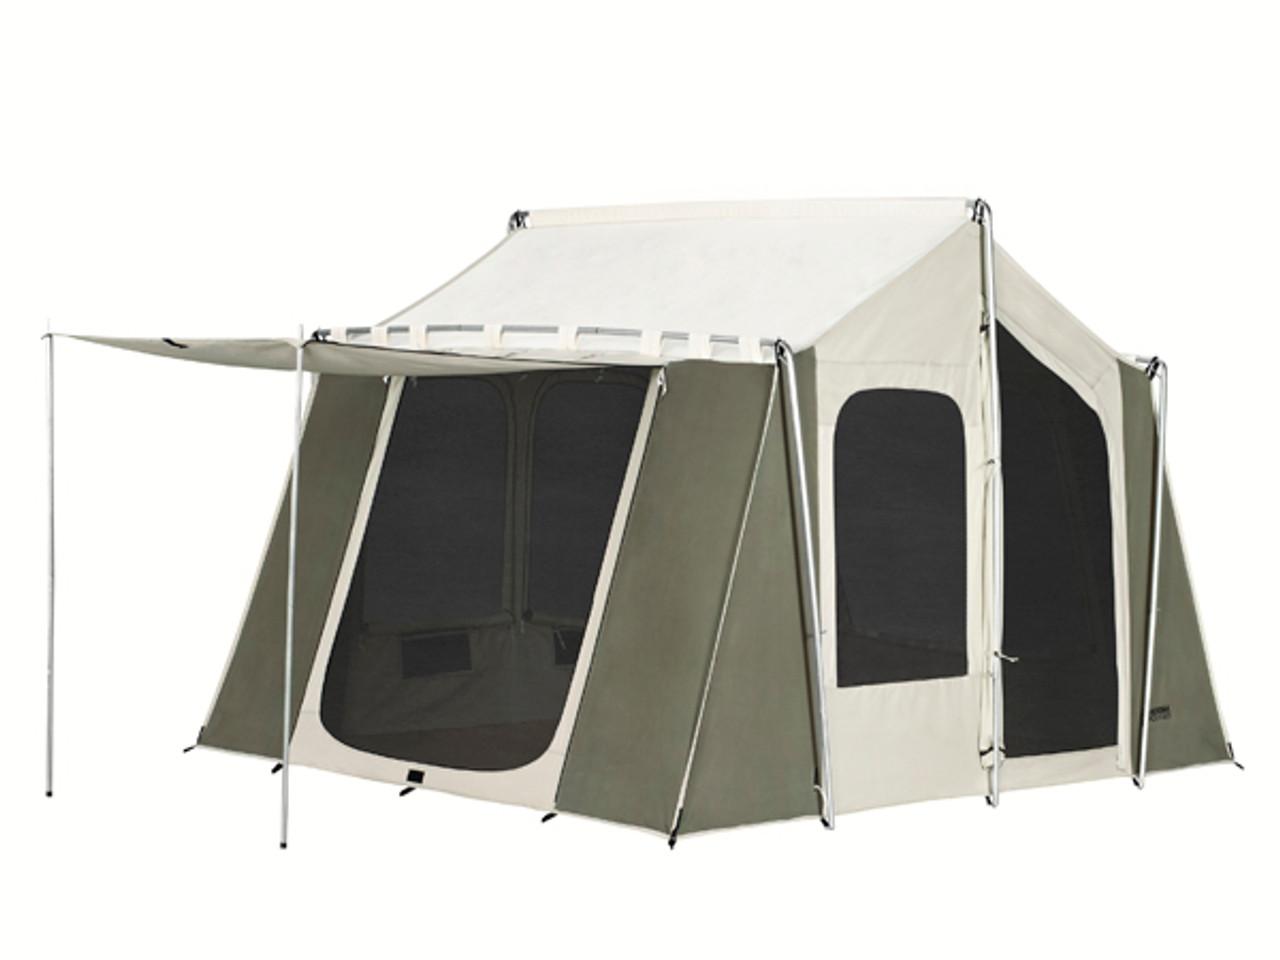 Tent Body 6121 - Estimated Restock Date Sep. 1st, 2021